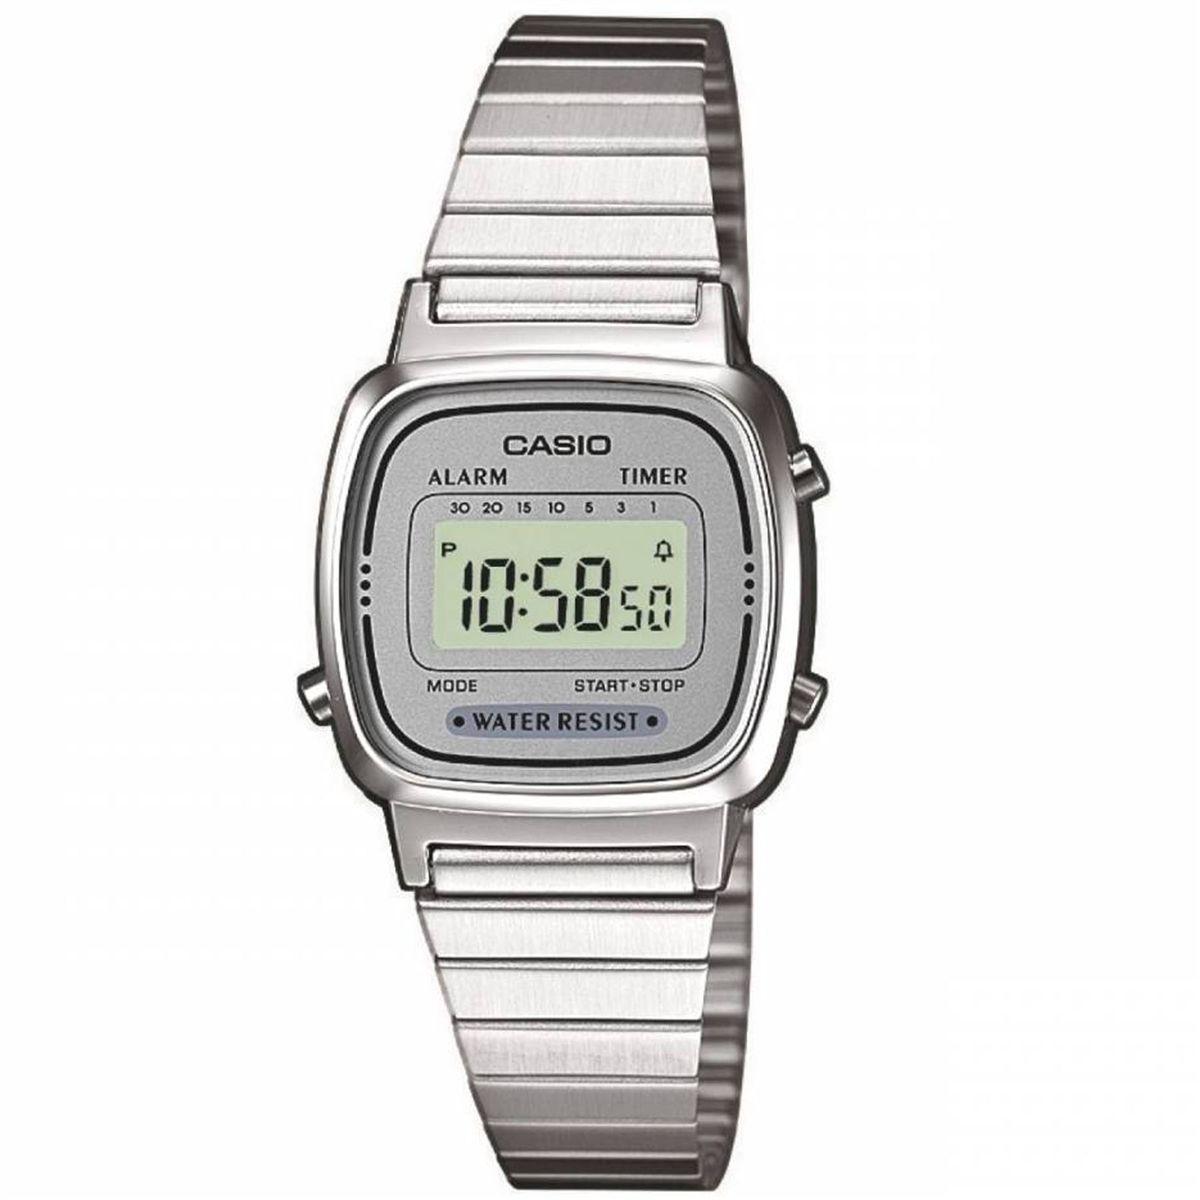 73751771550e Relógio Casio Vintage Digital Unissex LA670WA-7DF Produto não disponível